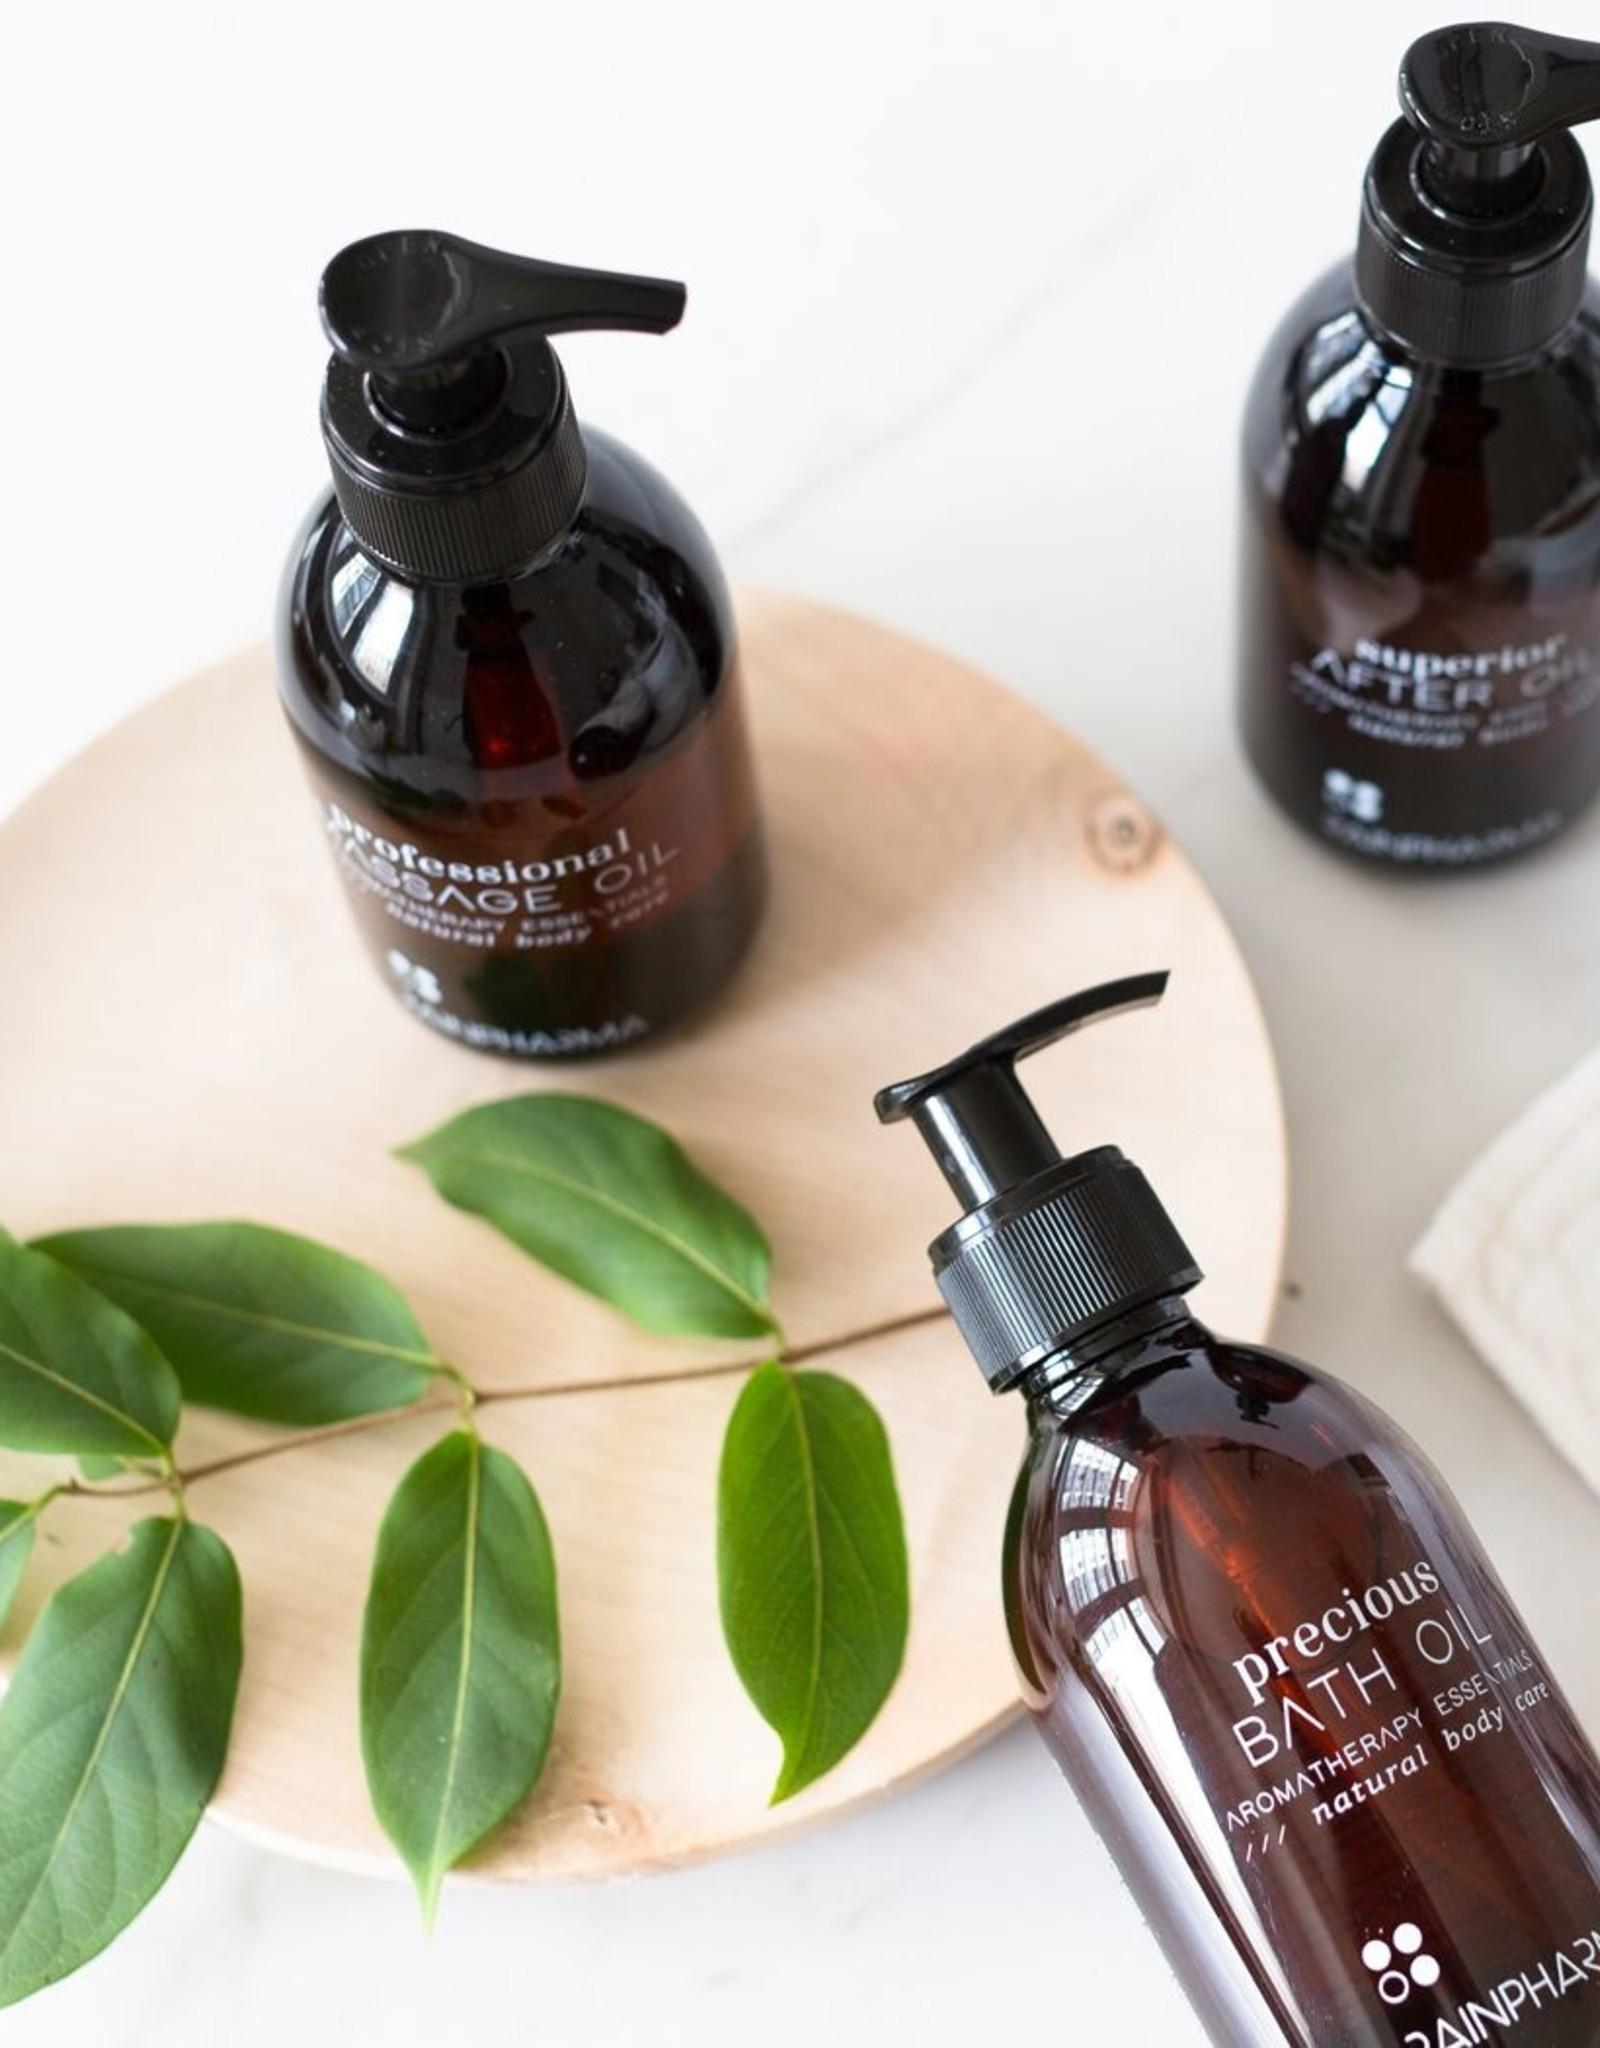 RainPharma Precious Bath Oil 250ml - Rainpharma